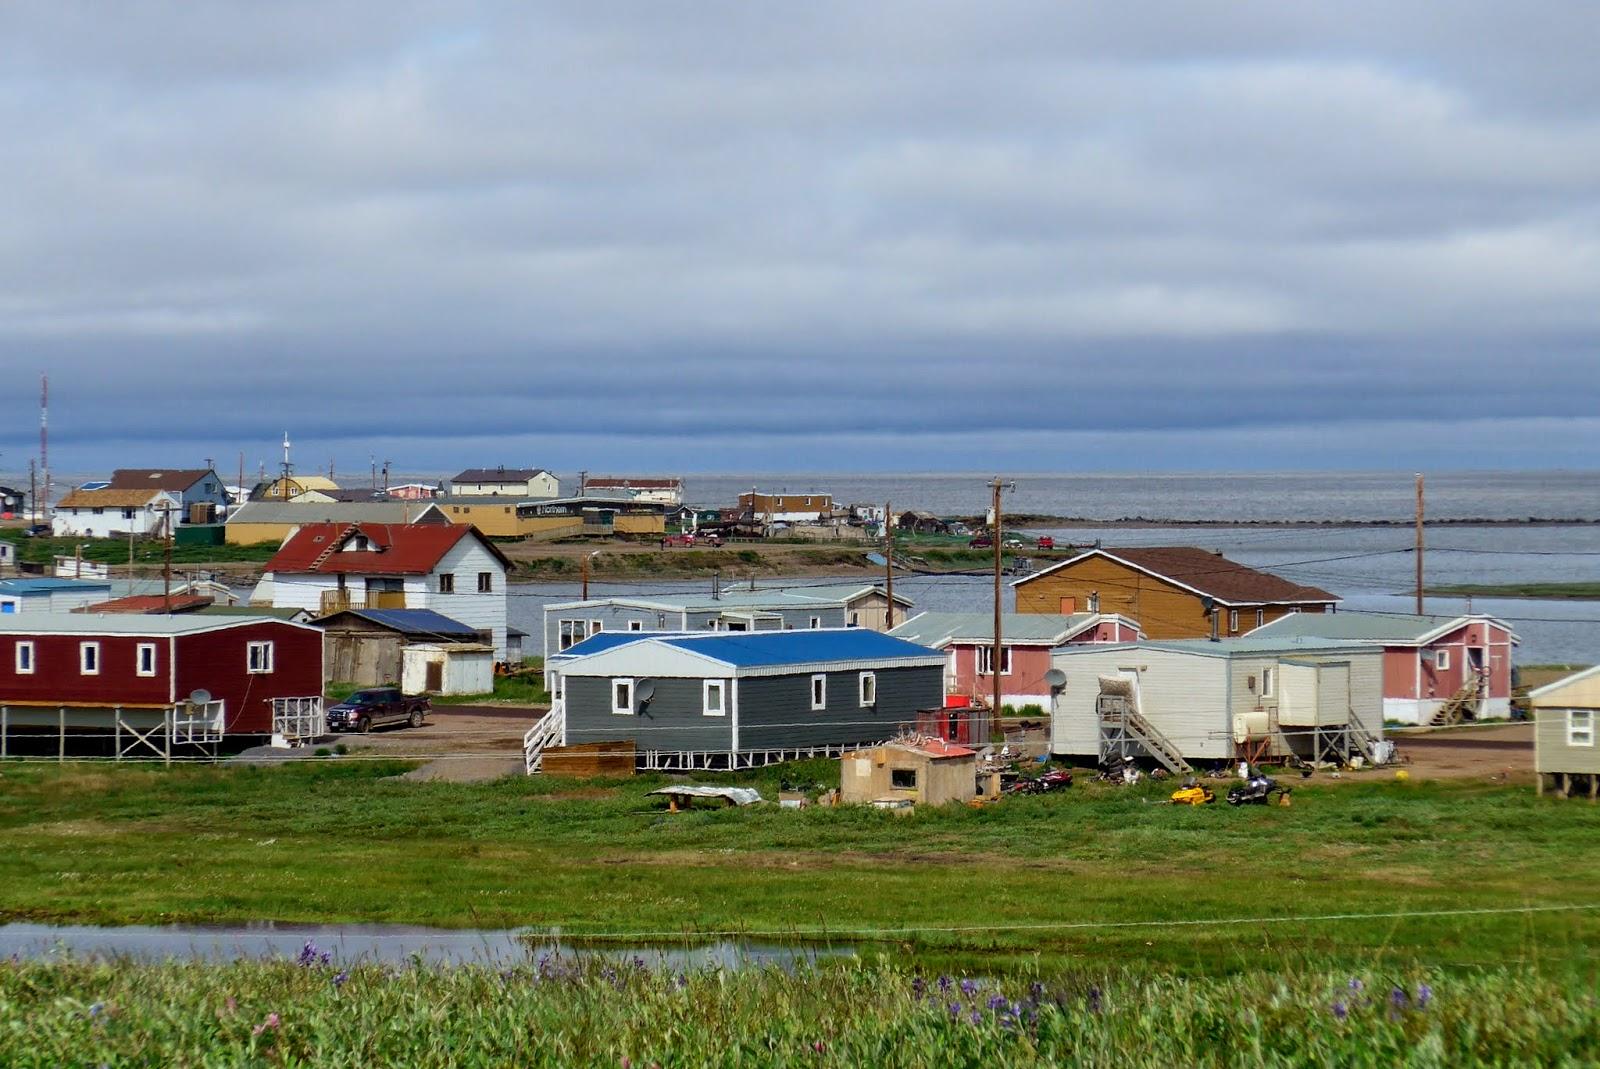 Village and ocean.